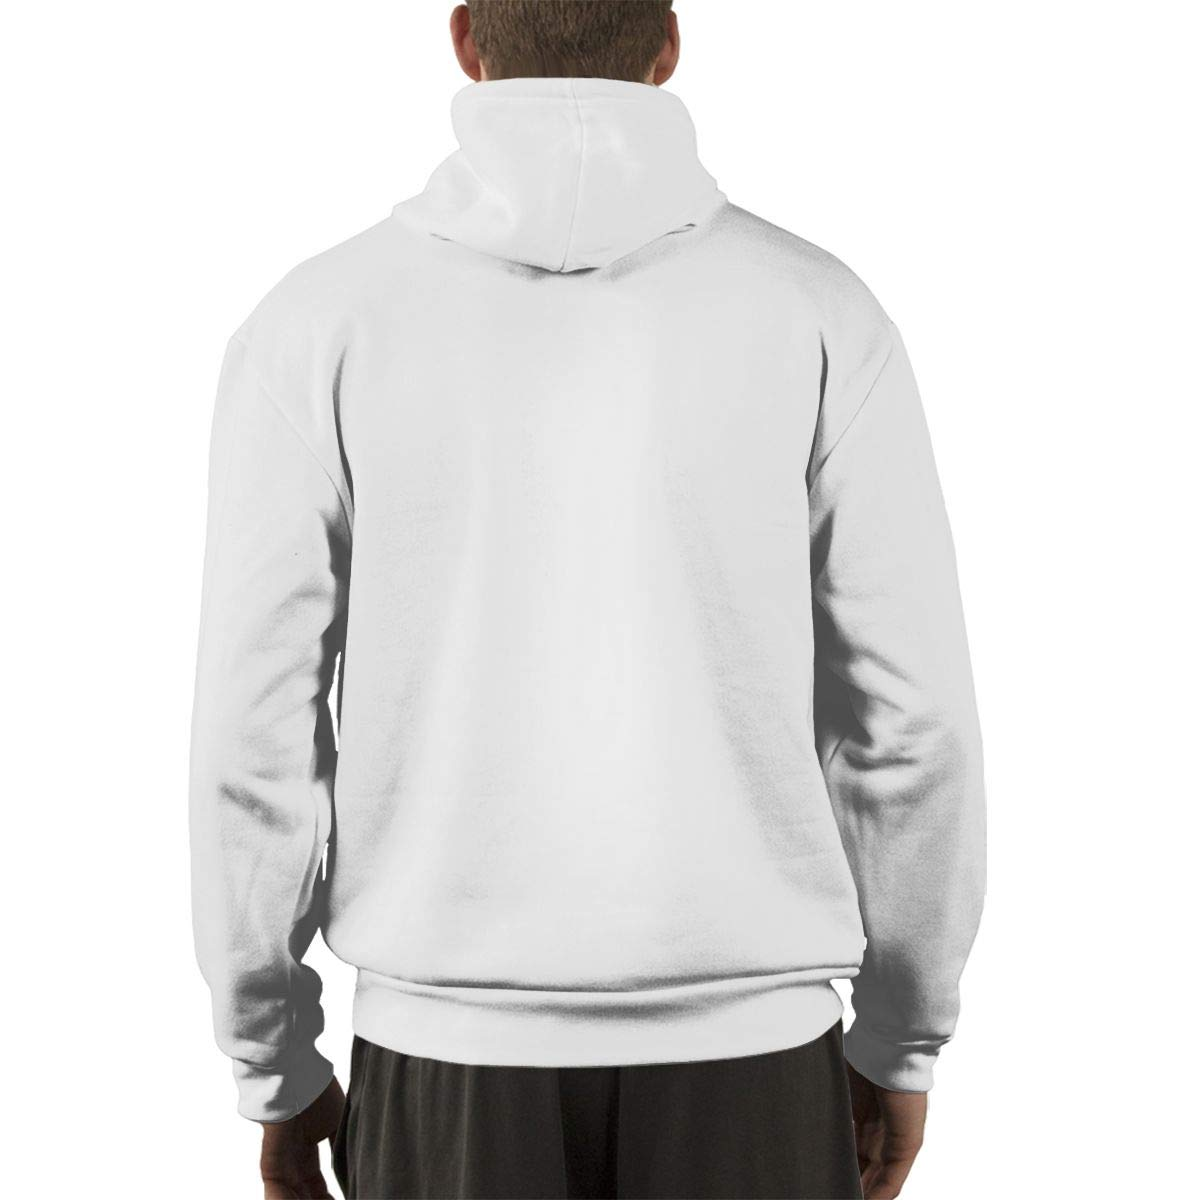 8c59fbe0c999 ... Zinmmerm Men's Fashion Travis-Scott- Travis-La-Flame Hooded